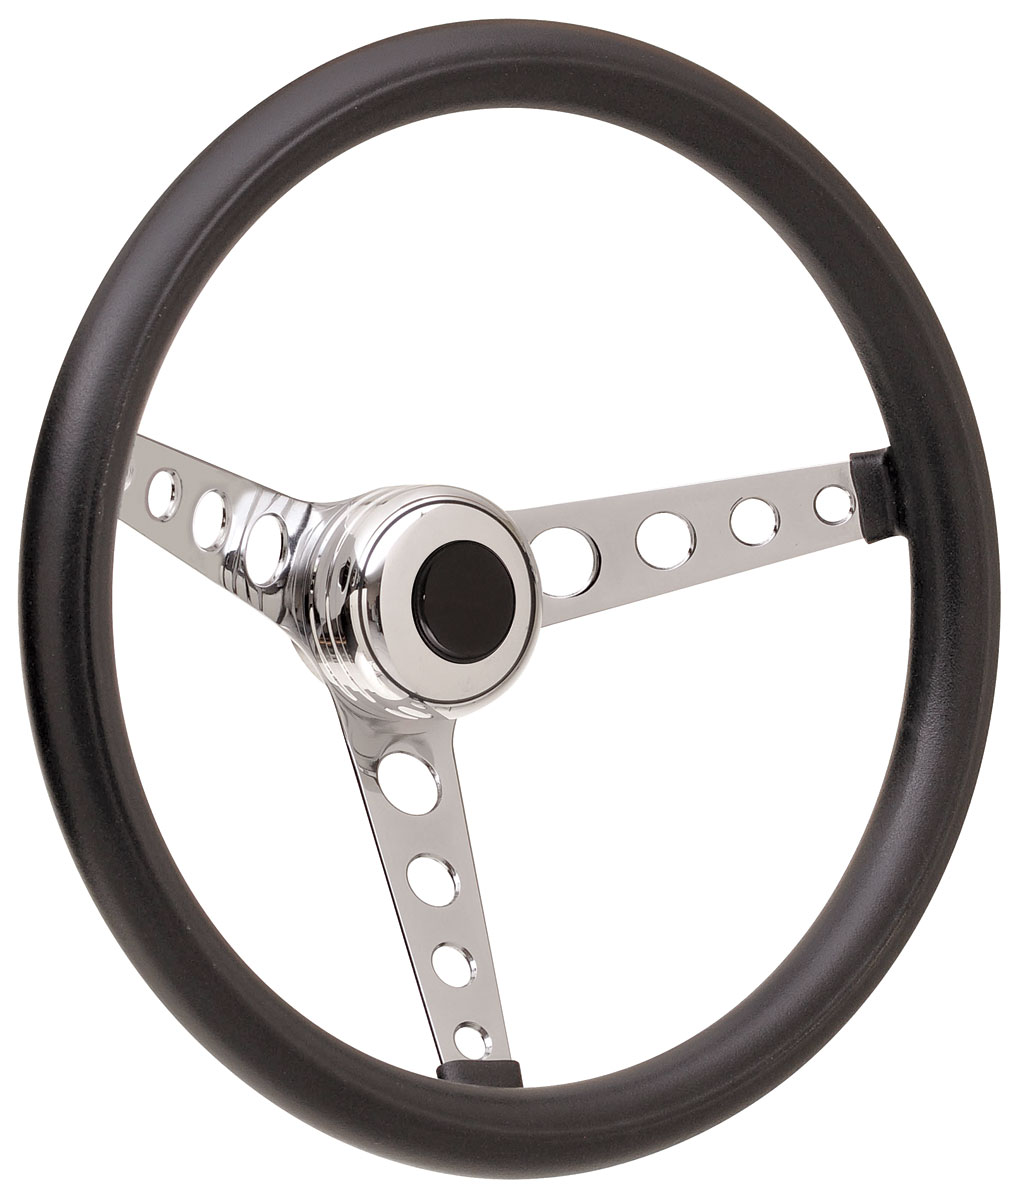 Steering Wheel Kit, 59-68 GM, Classic Foam, Tall Cap, Plain, Black